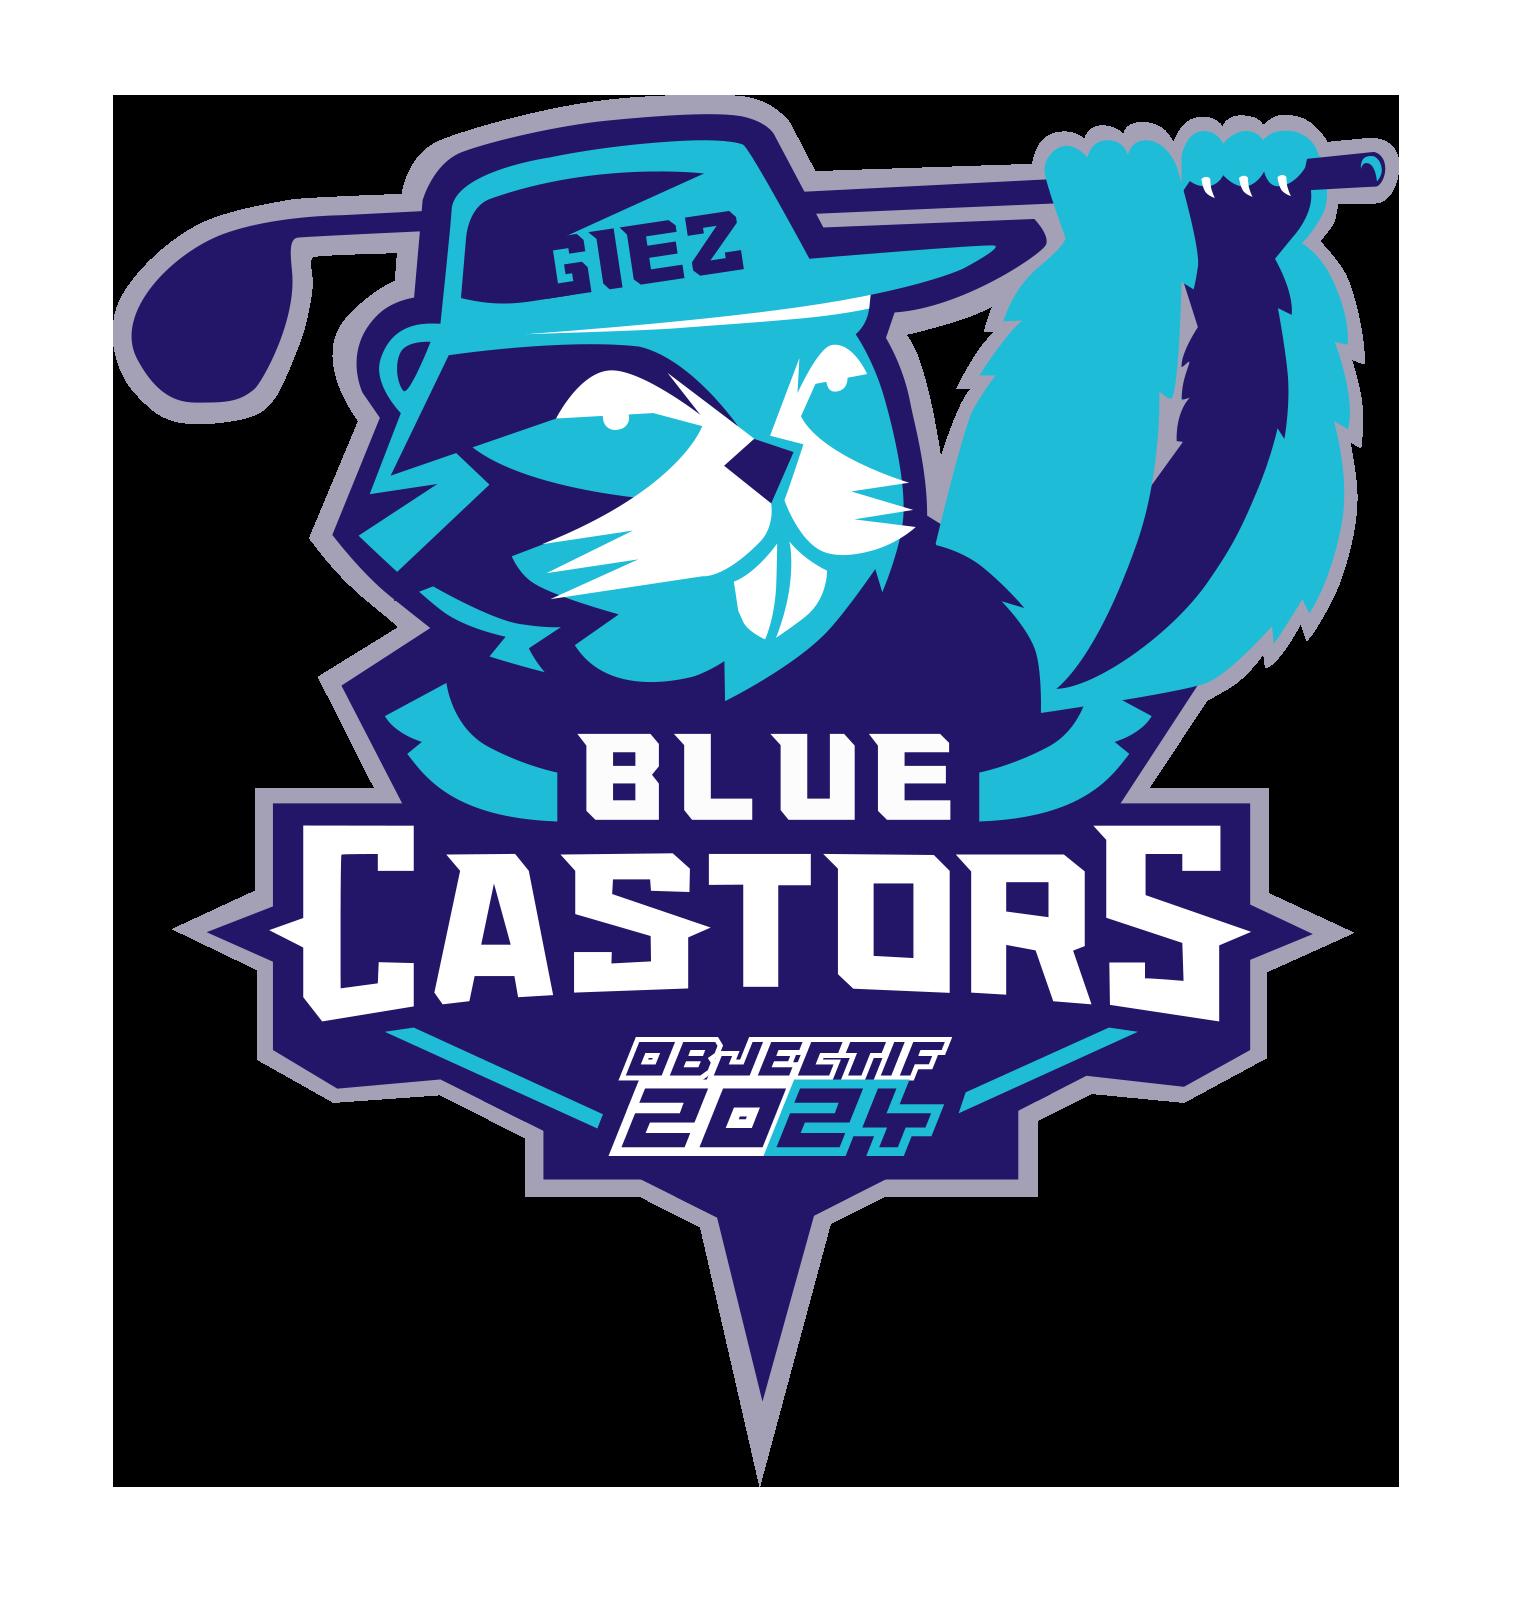 Bluecastors logo v2